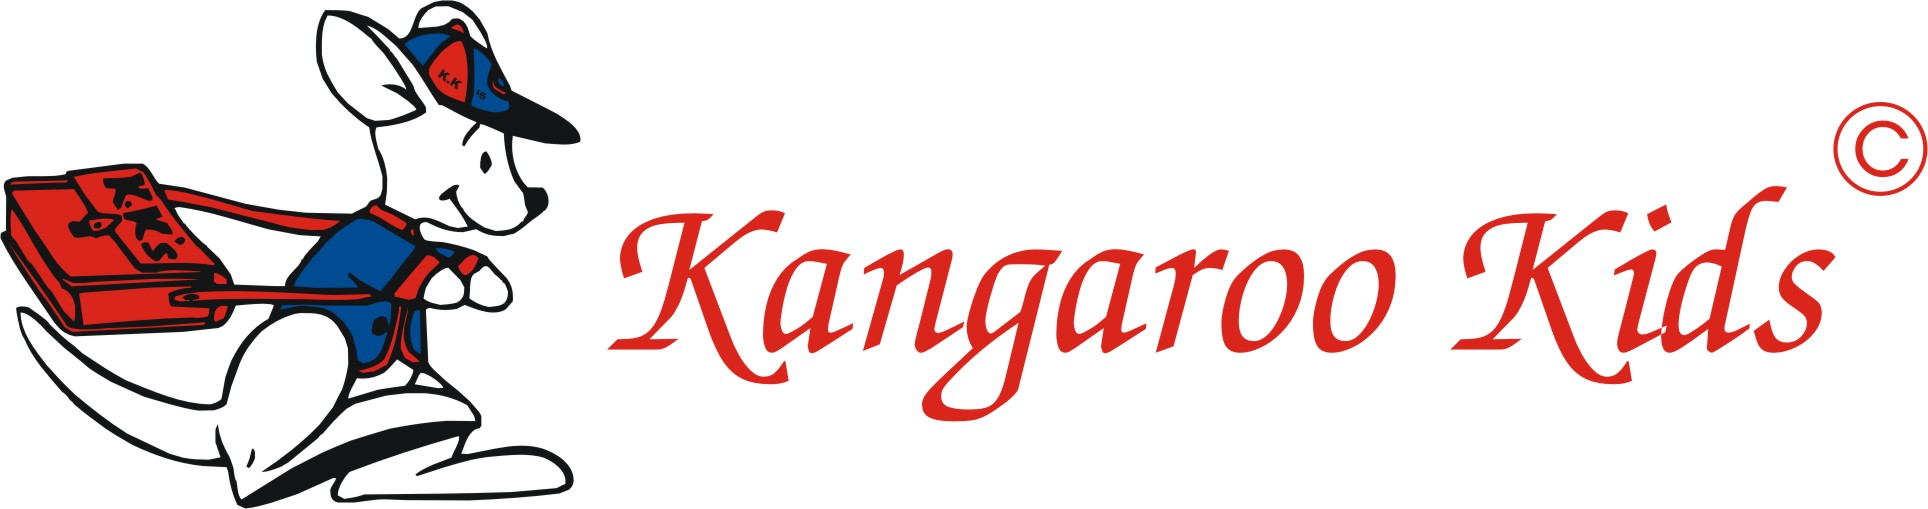 Kangaroo Kids - Kandivali - Mumbai Image